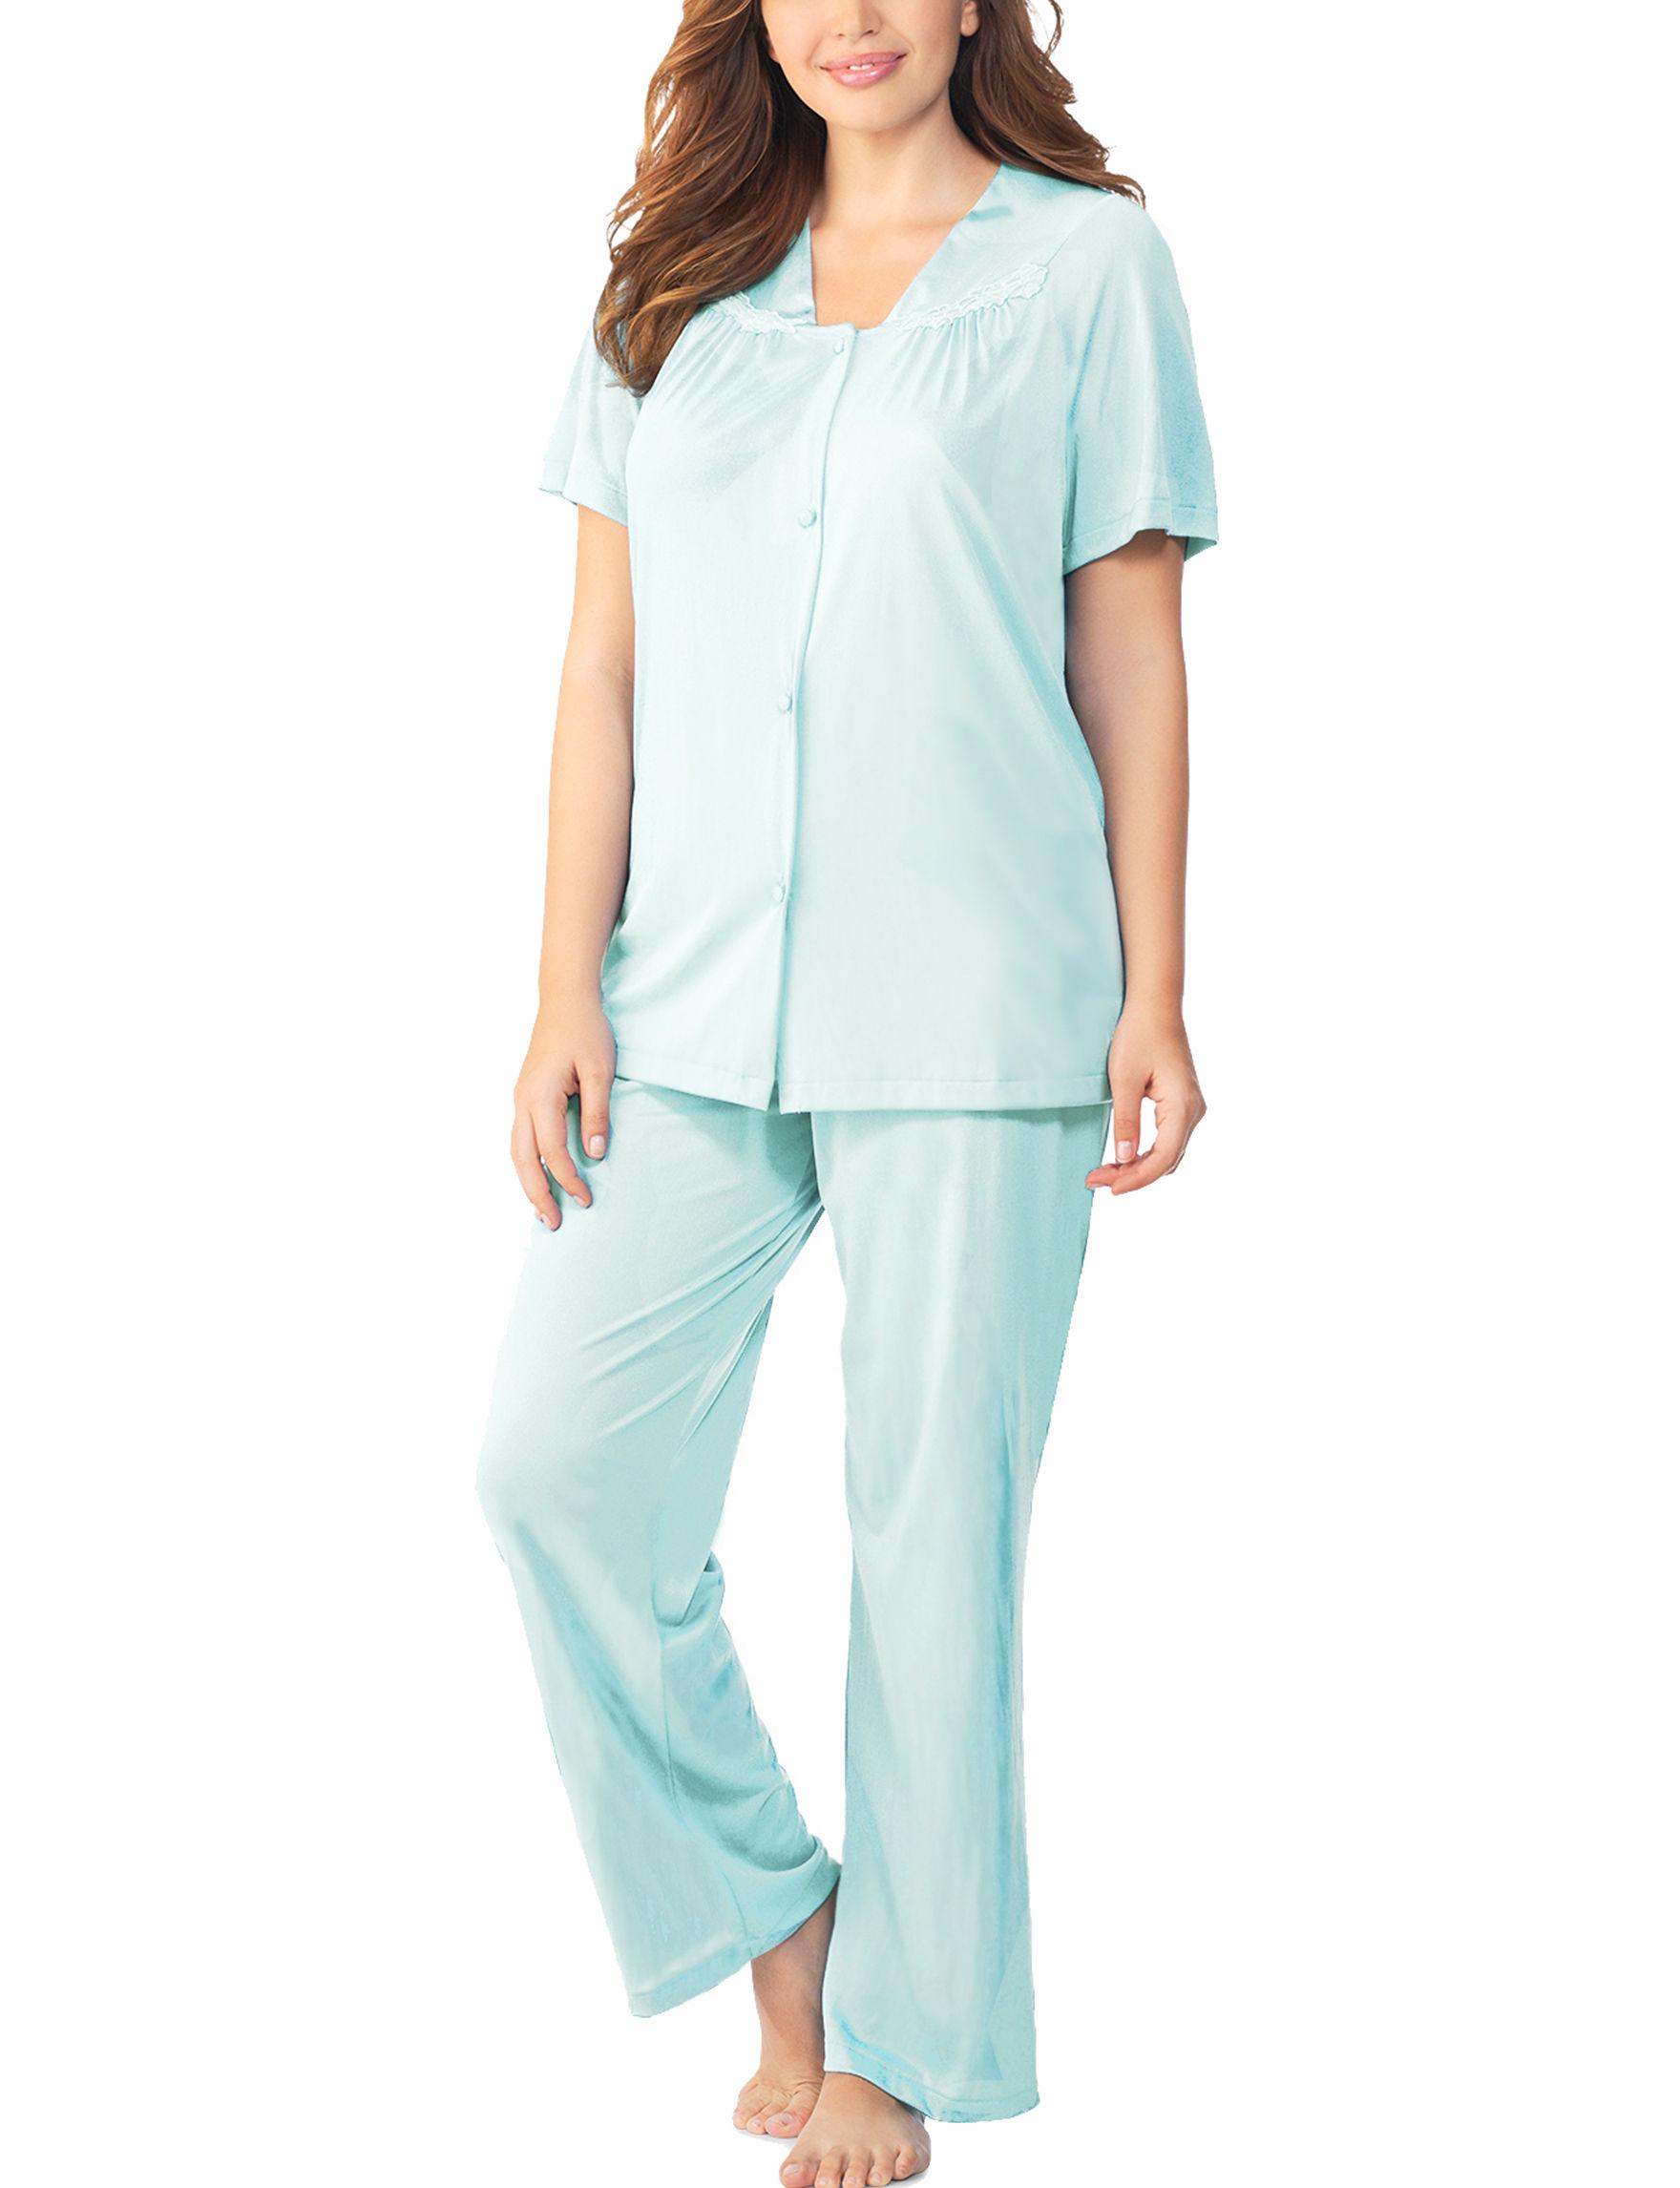 Exquisite Form Azure Mist Pajama Sets